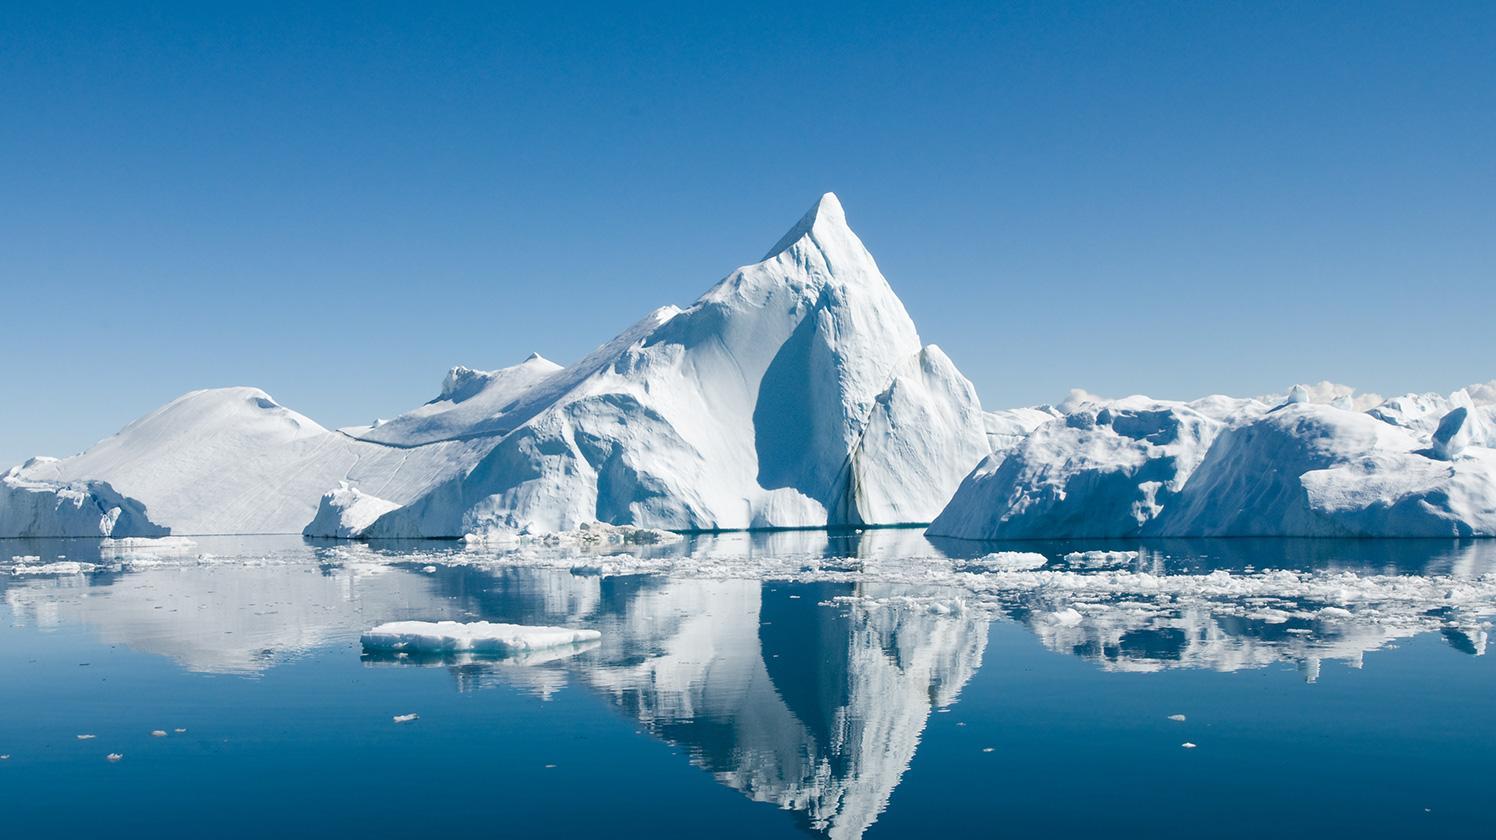 BRITA planeta saudável iceberg flutuante